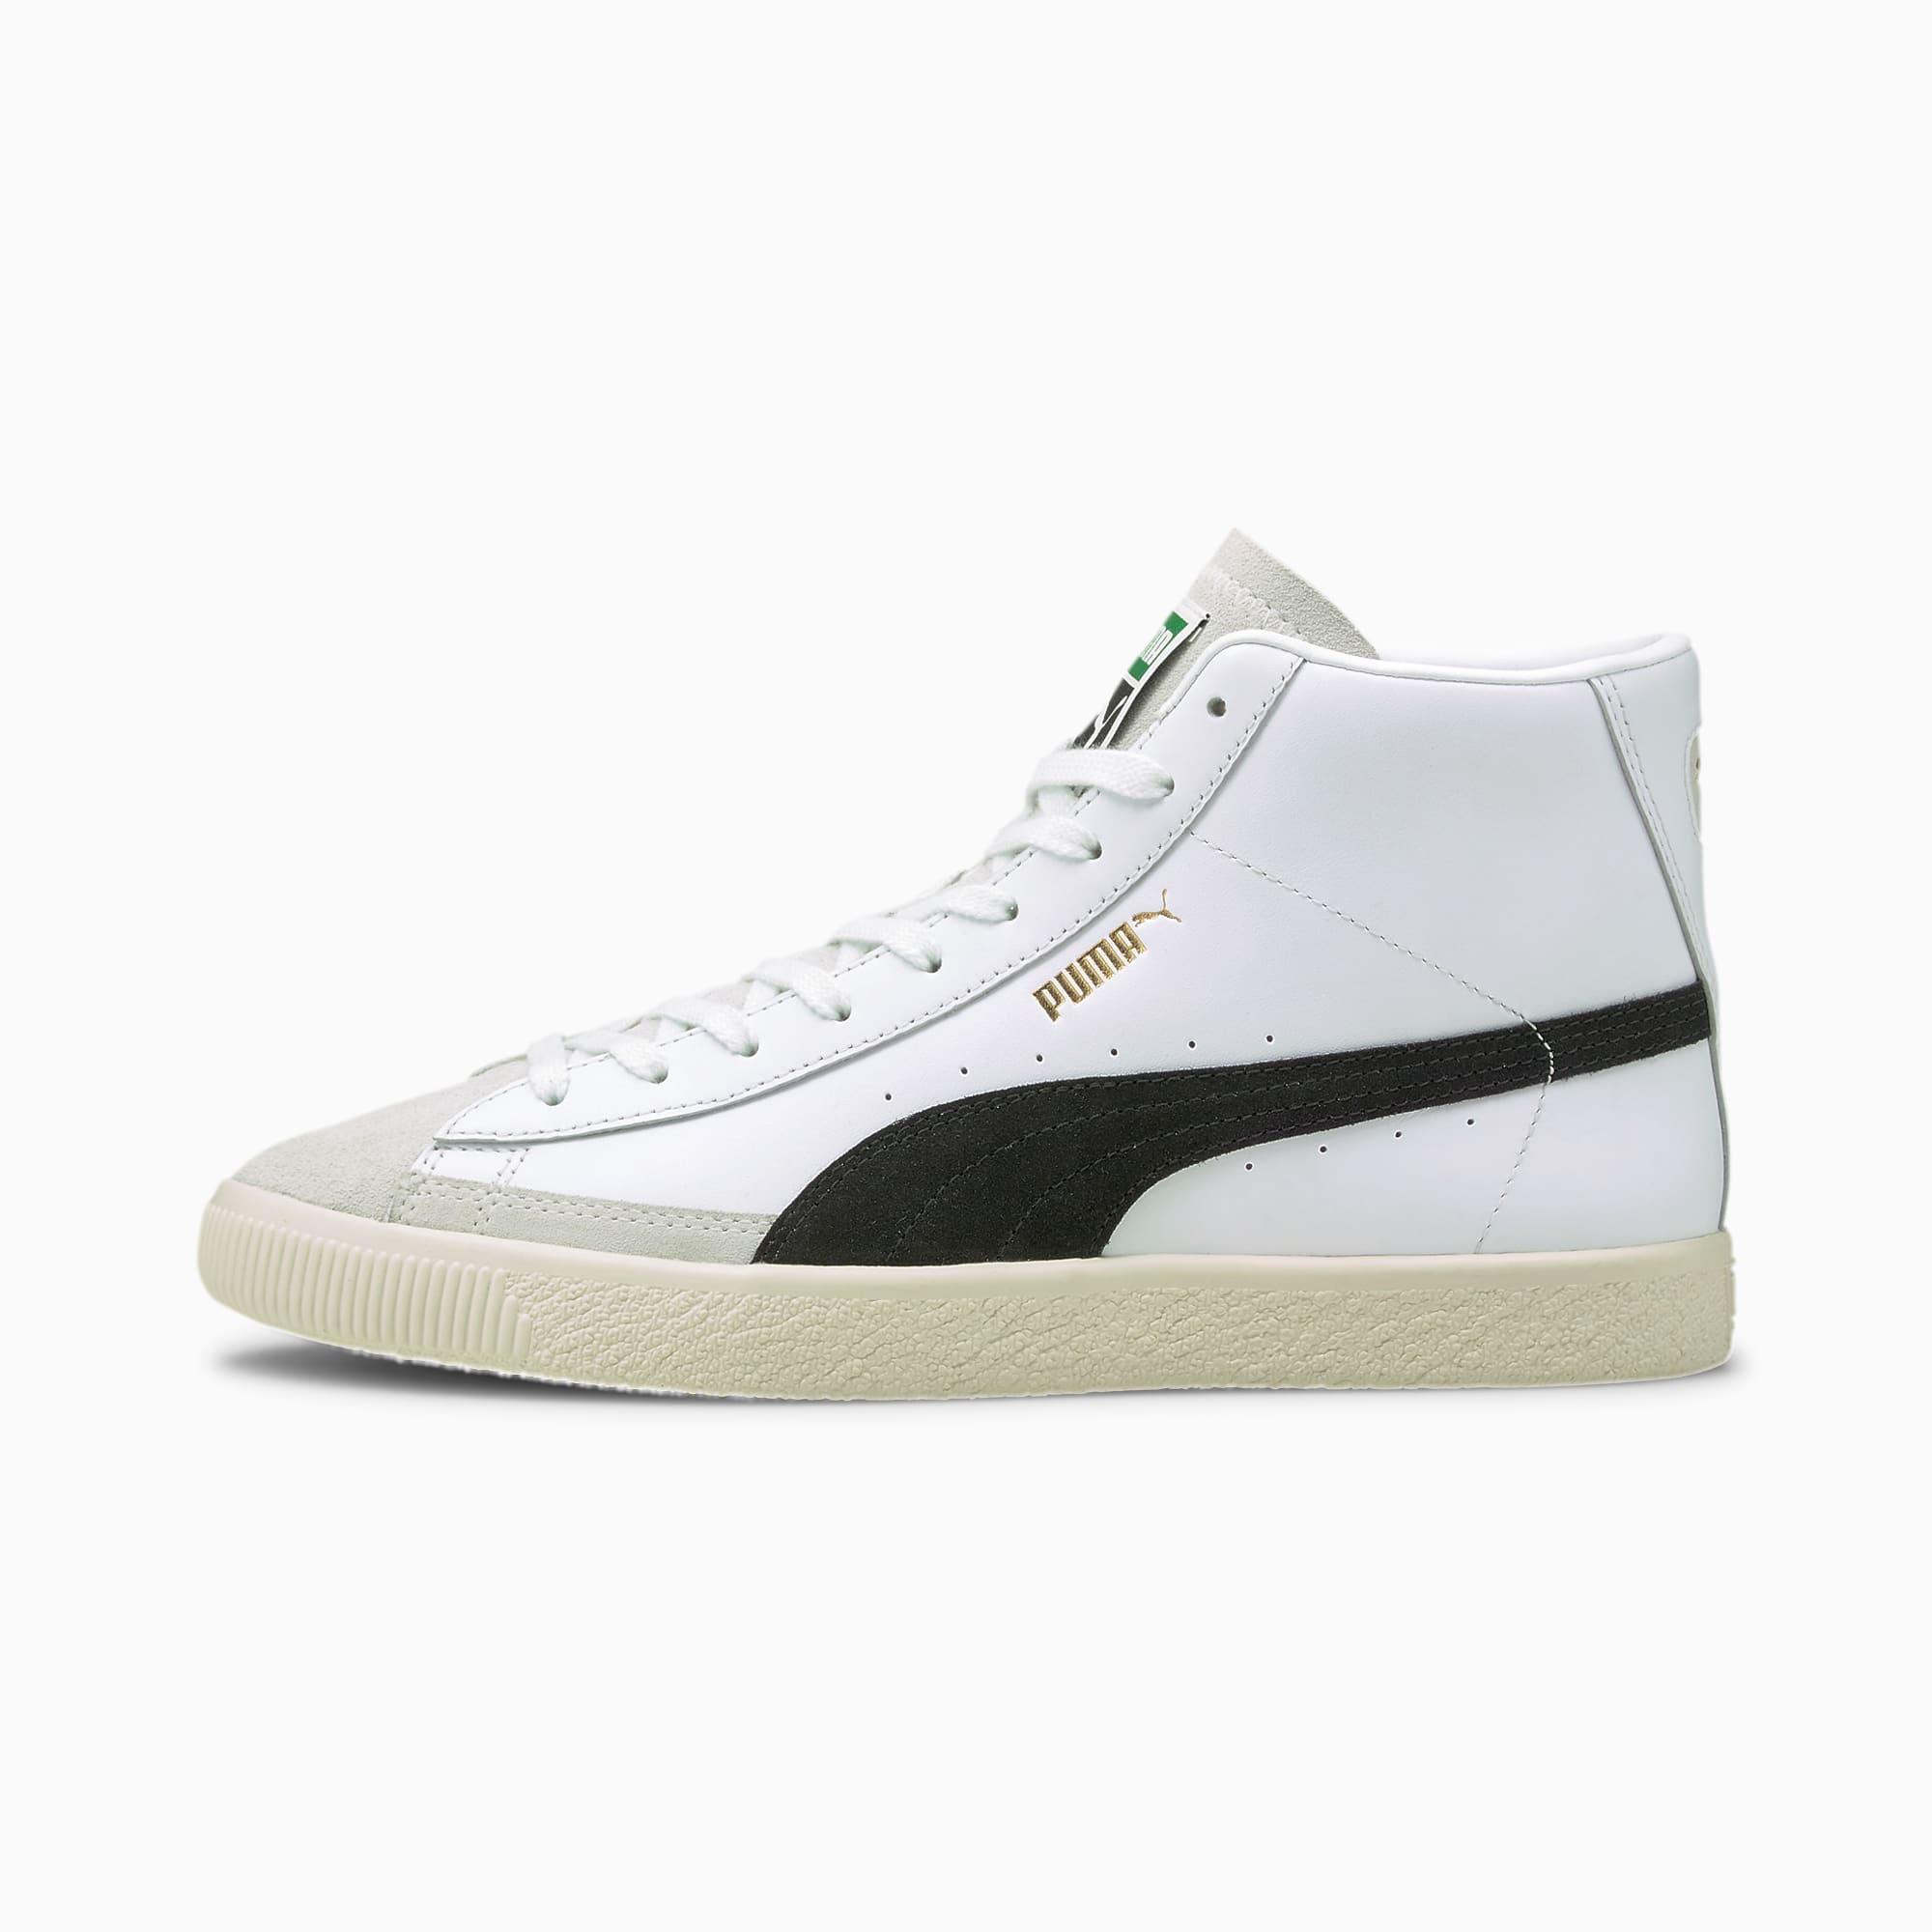 Chaussure Baskets Basket Mid Vintage, Or/Noir/Blanc, Taille 42, Chaussures - PUMA - Modalova